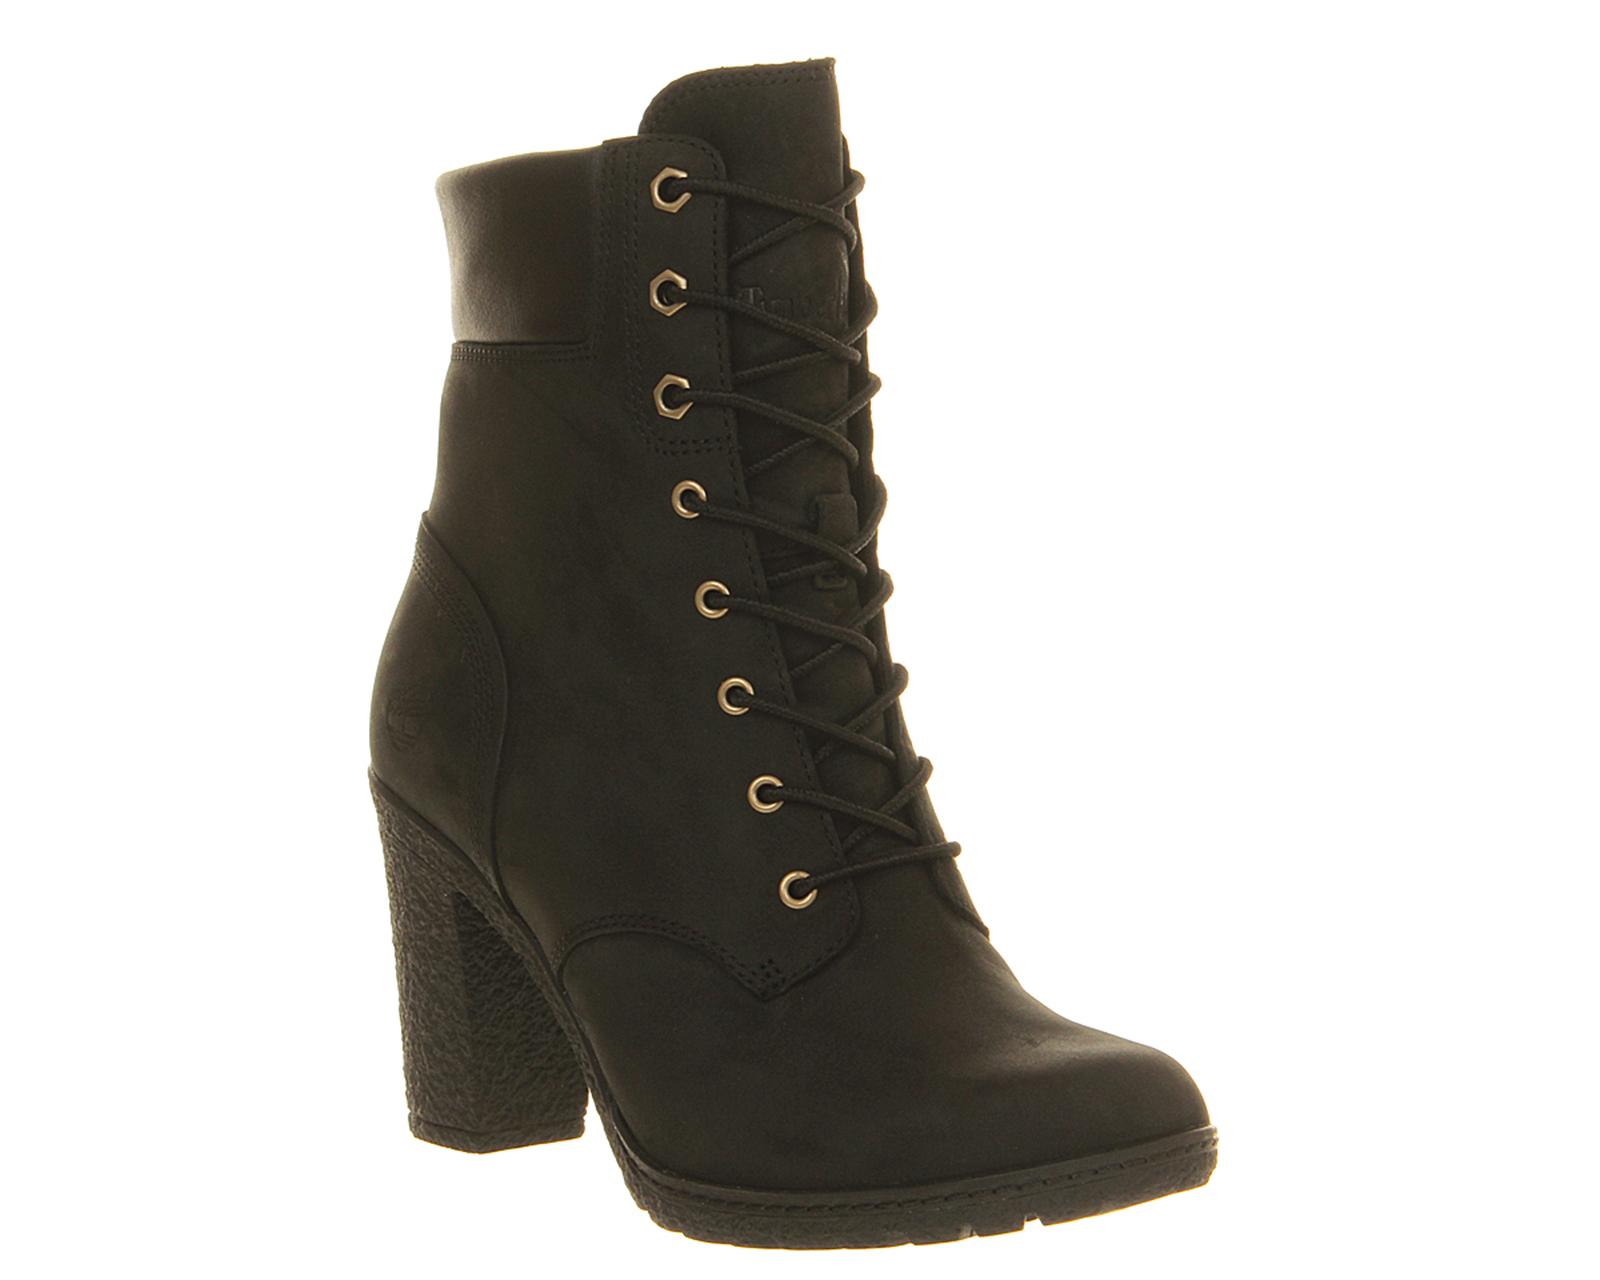 Book Of Black Timberland High Heel Boots Women In